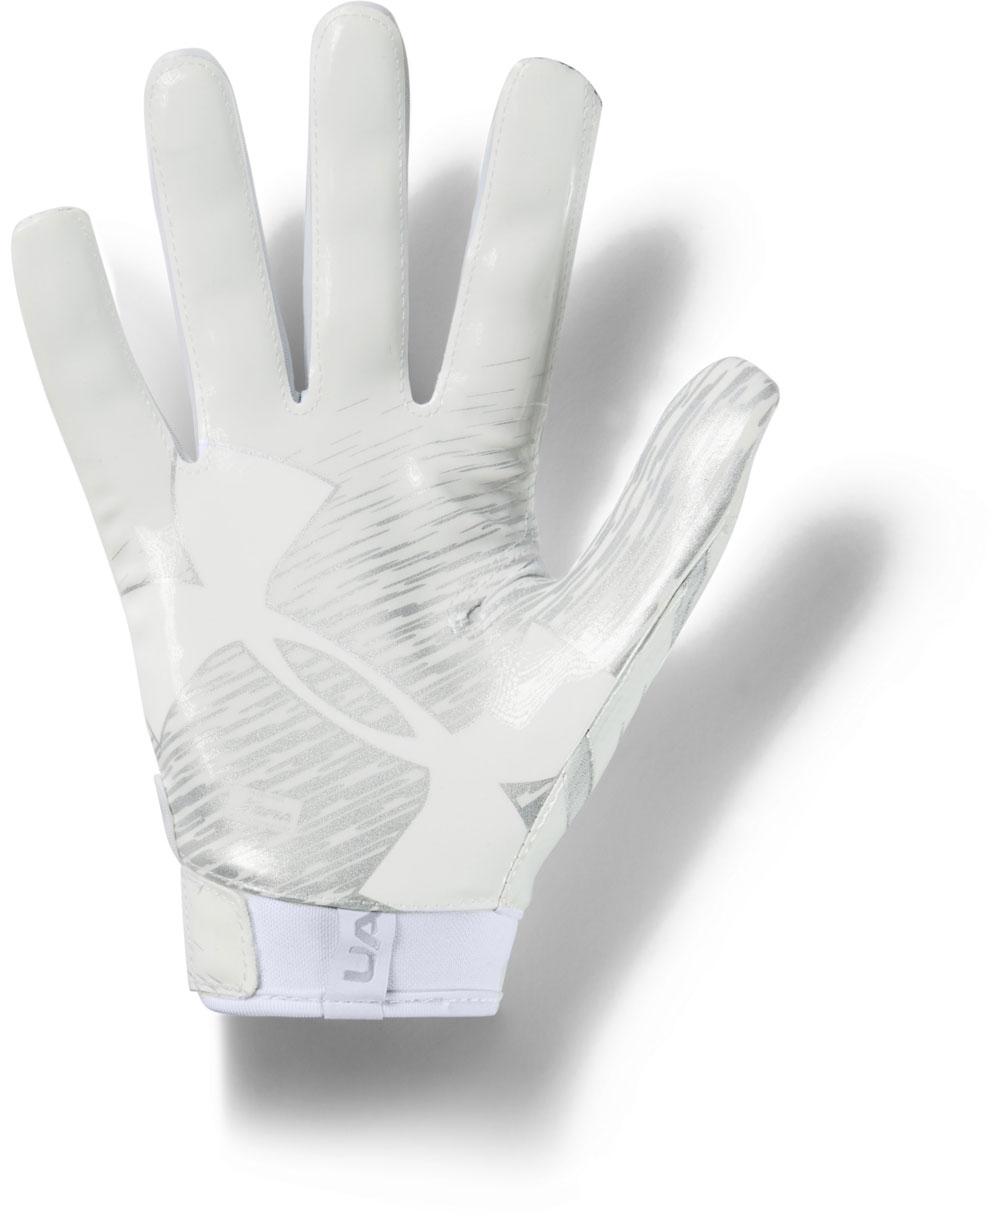 UA F7 Gants Football Américain Homme White/Metallic Silver